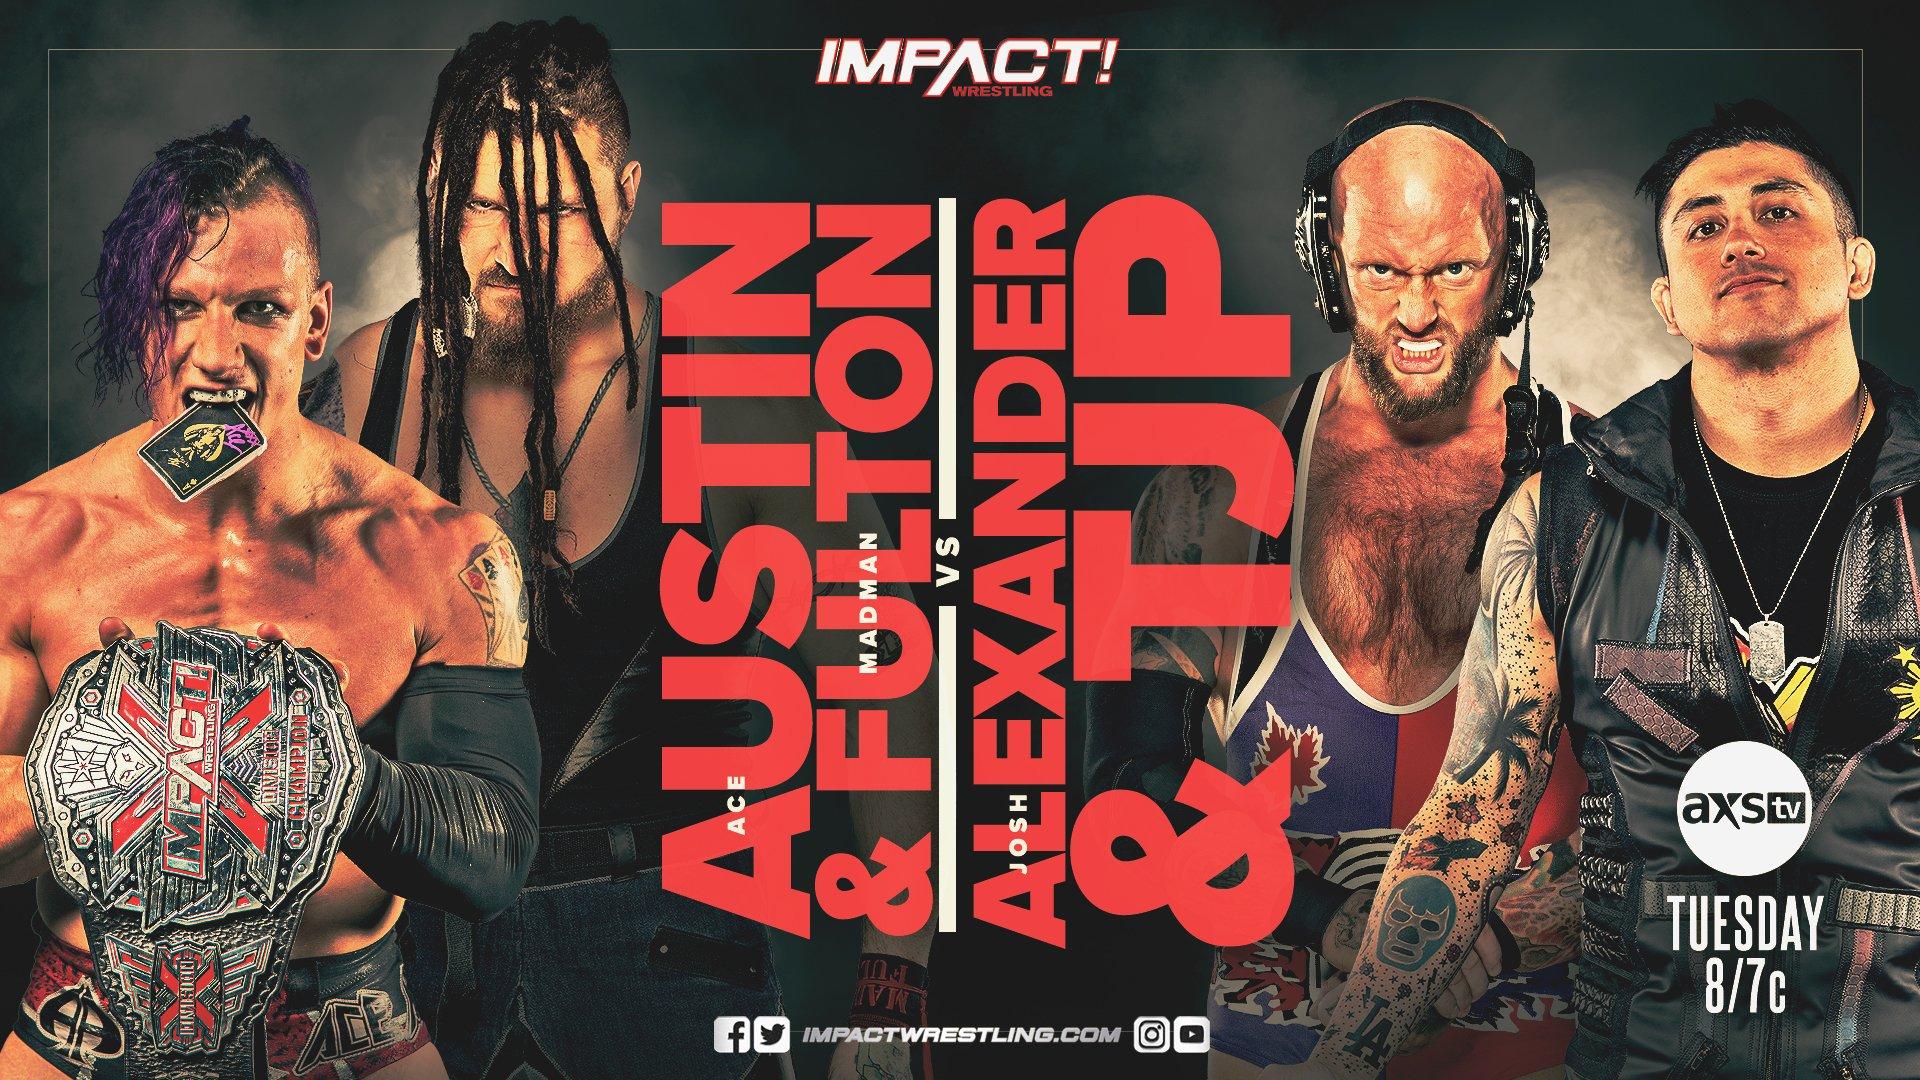 Ace Austin and Madman Fulton versus Josh Alexander and TJP